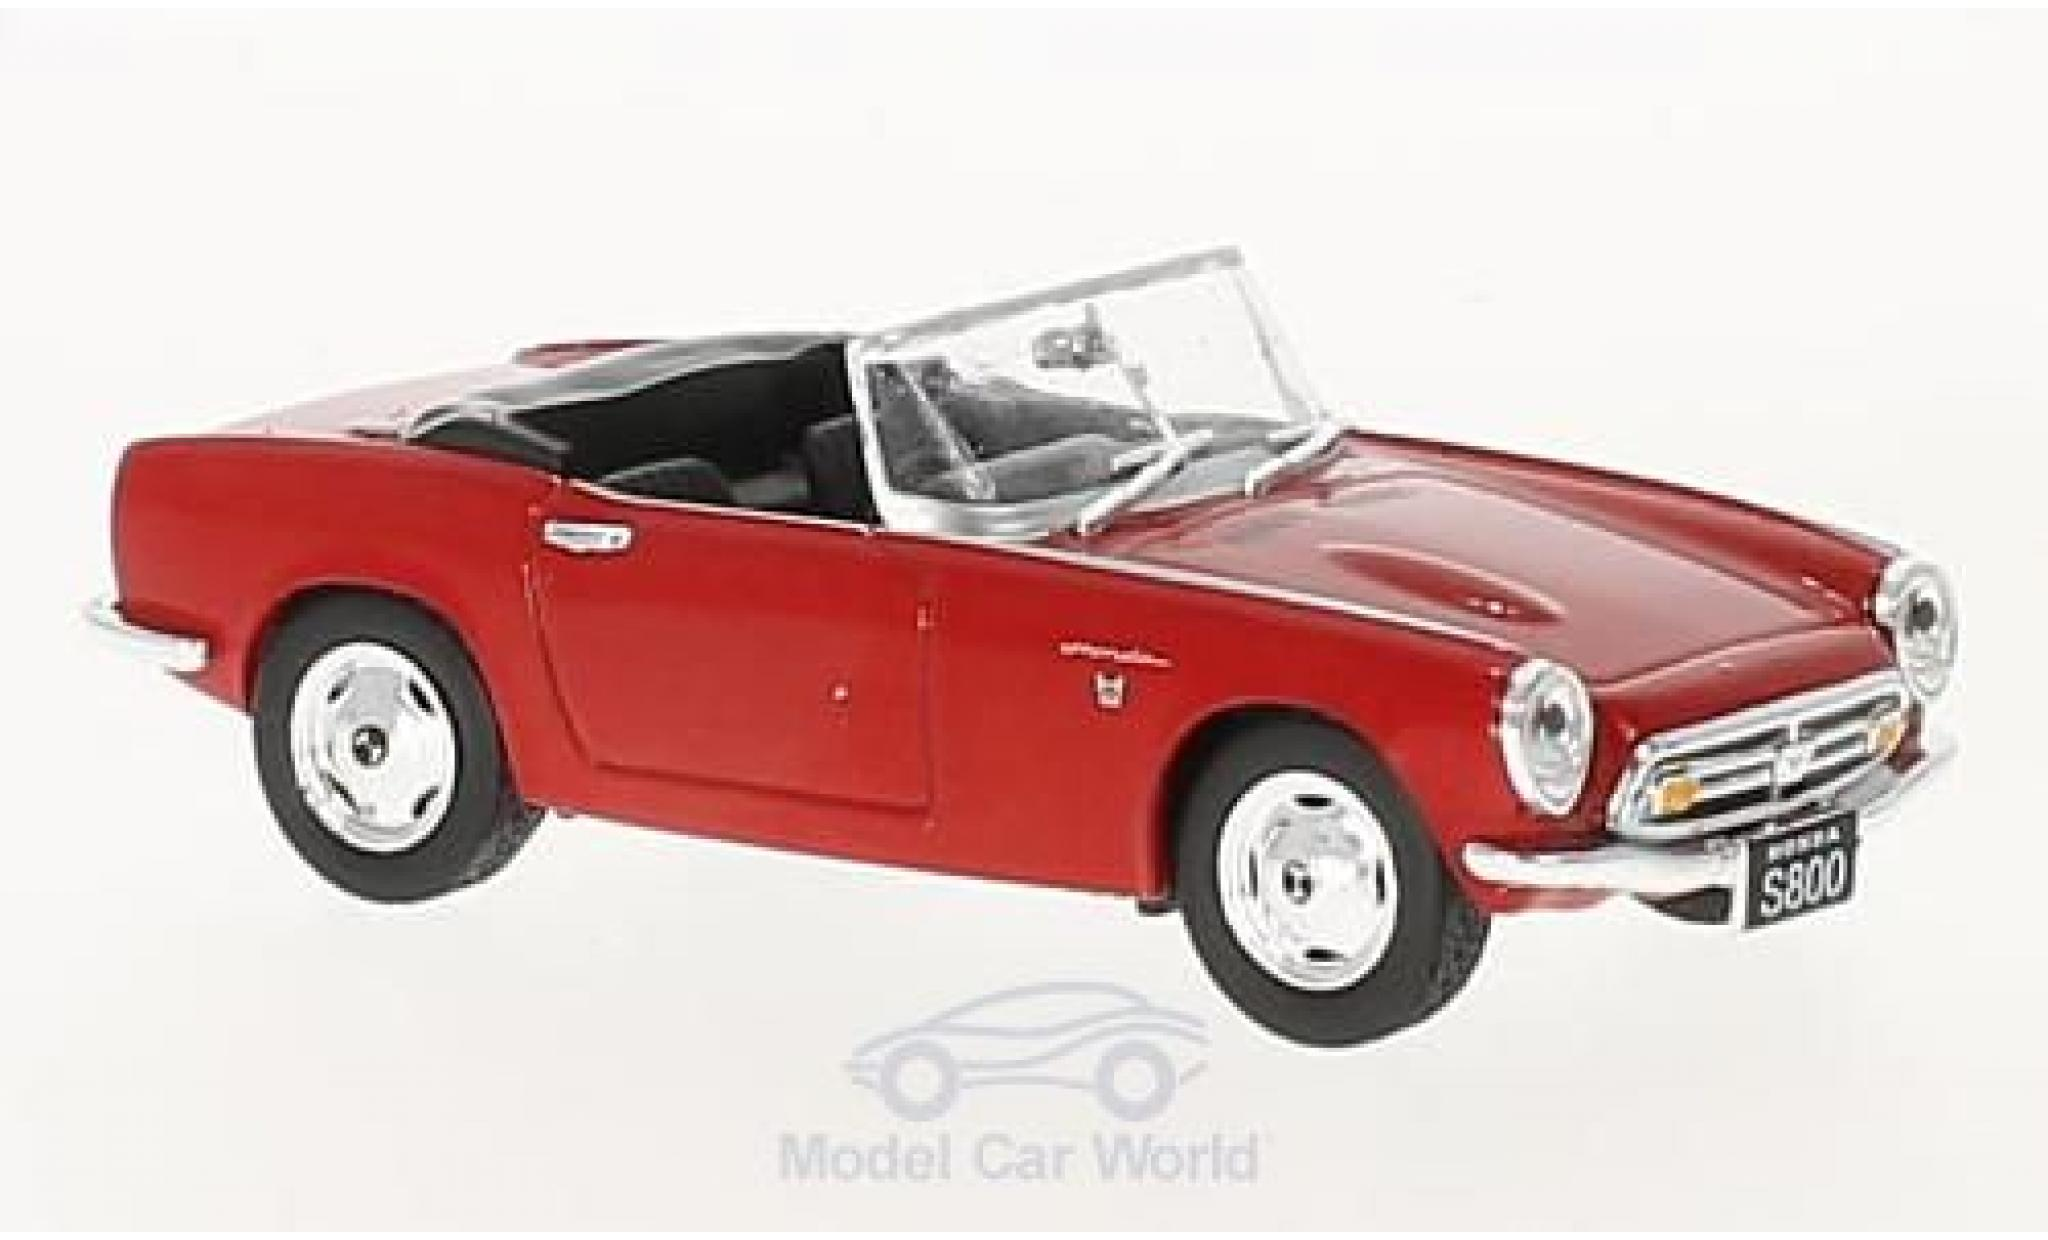 Honda S800 1/43 First 43 Models red RHD 1966 offen